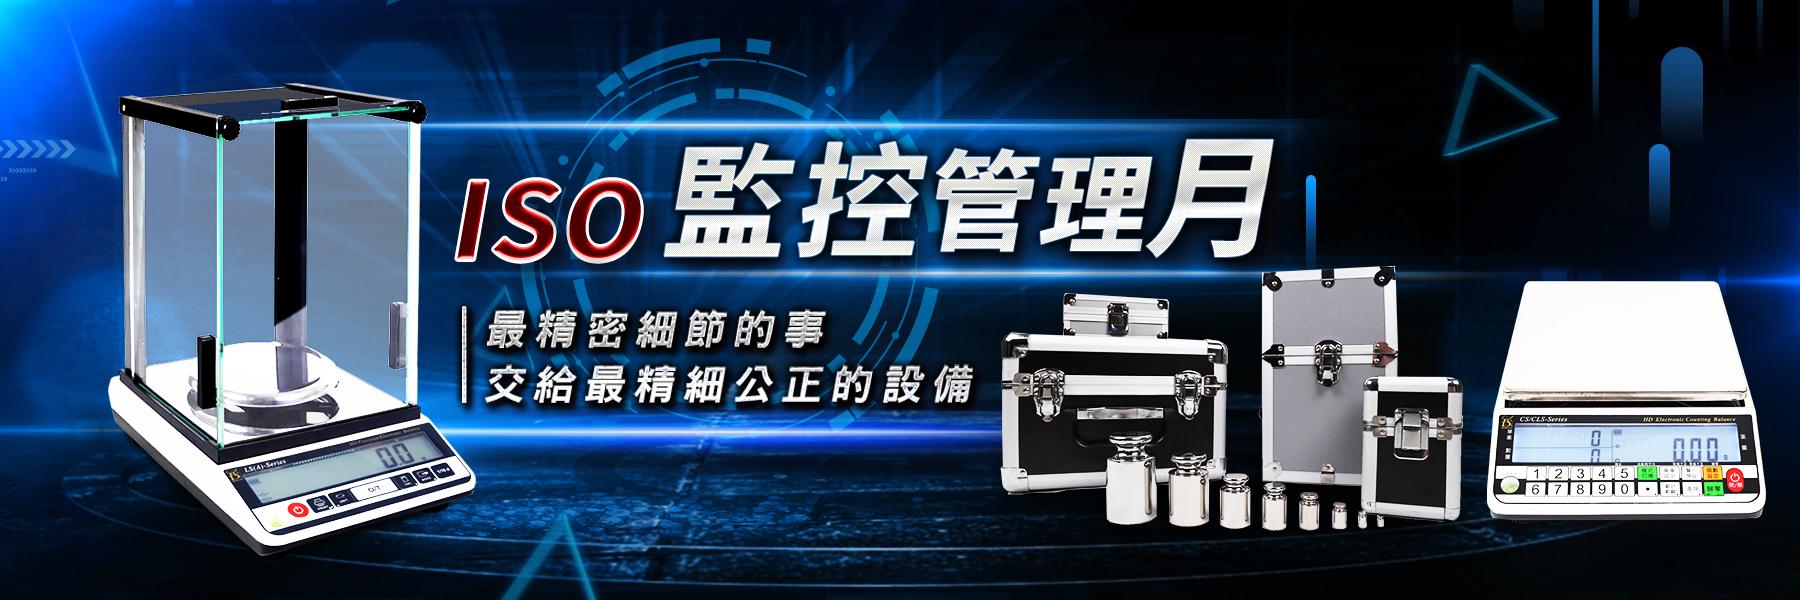 ISO監控管理月 電子天平 砝碼 | 沛禮國際 Polit 電子秤專賣